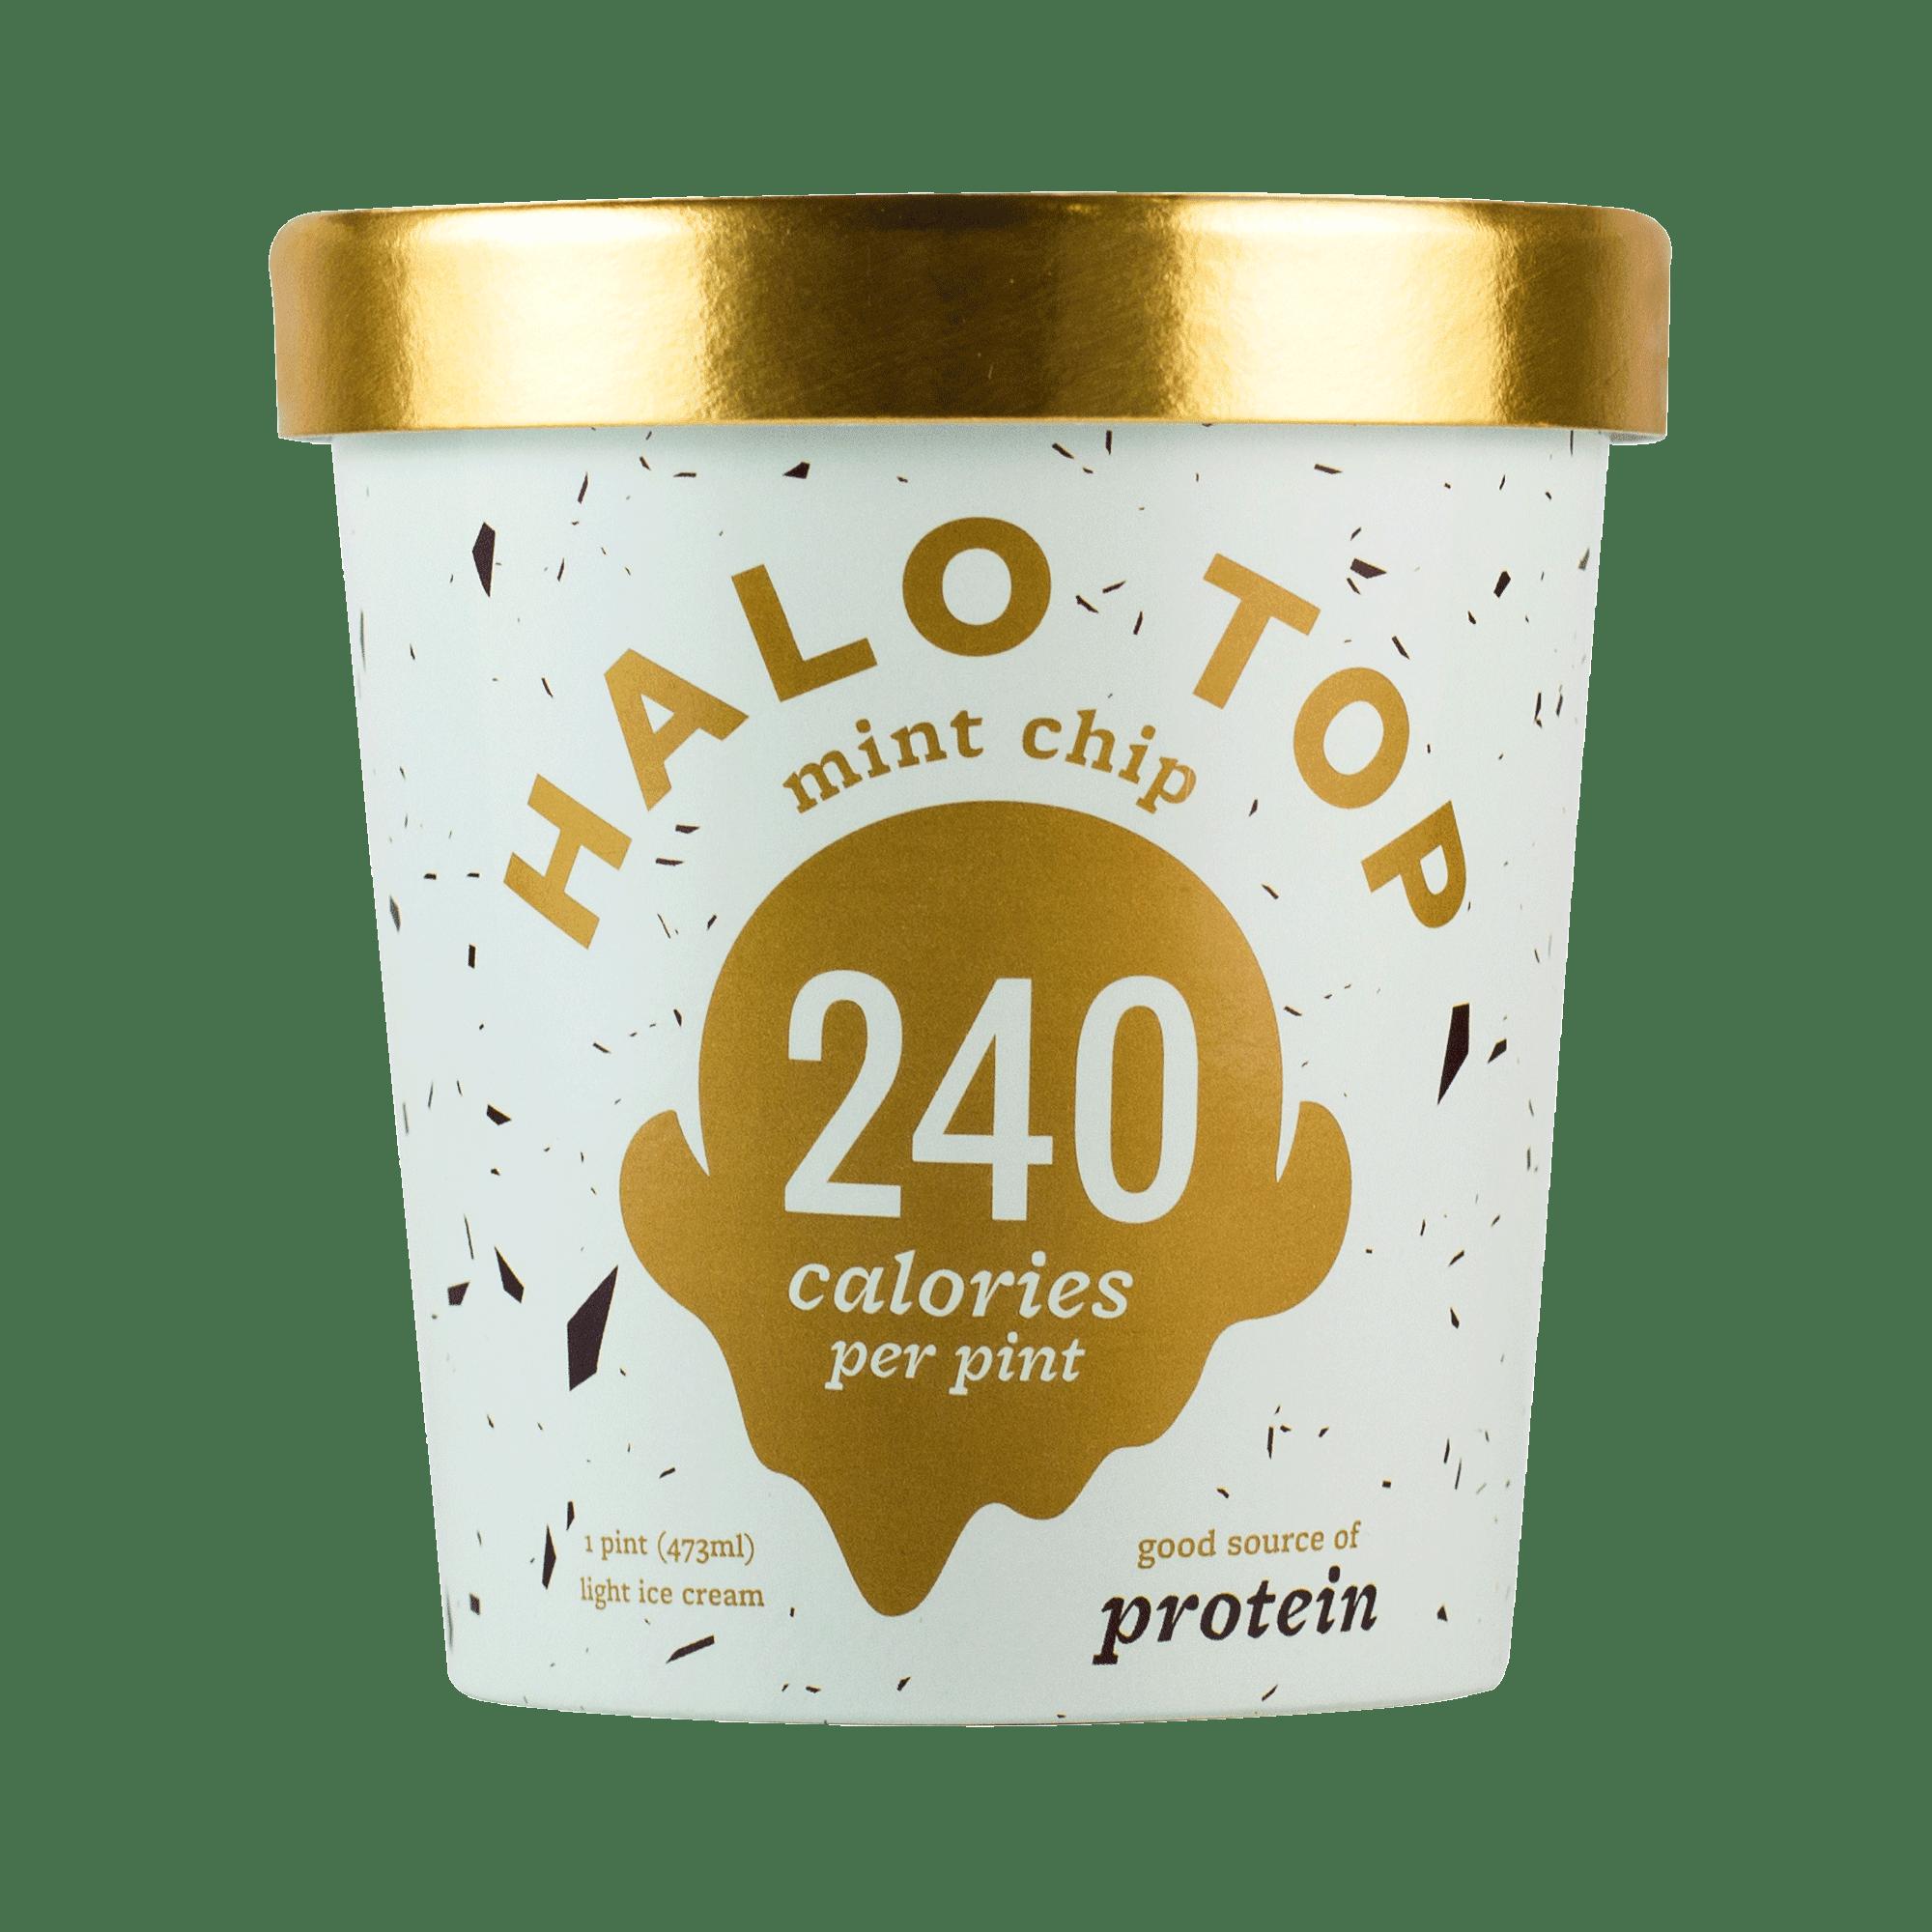 Halo Top Mint Chip Ice Cream 1 pint Walmartcom